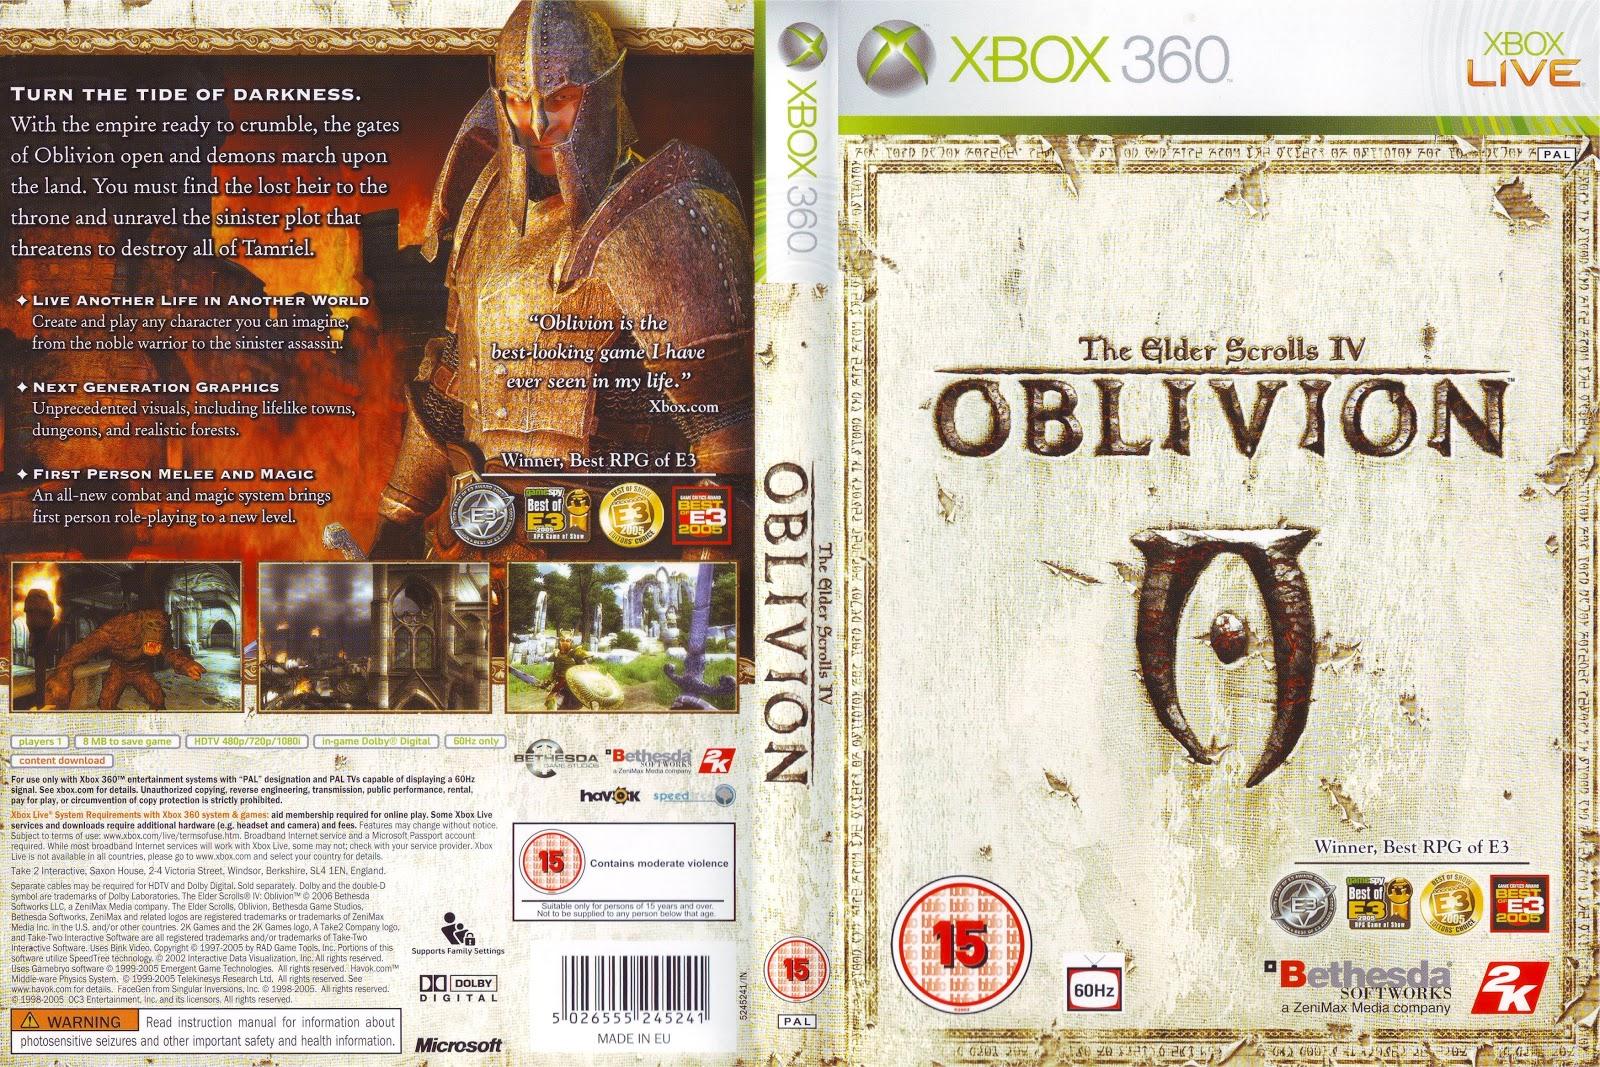 Capa The Elder Scrolls IV Oblivion Xbox 360